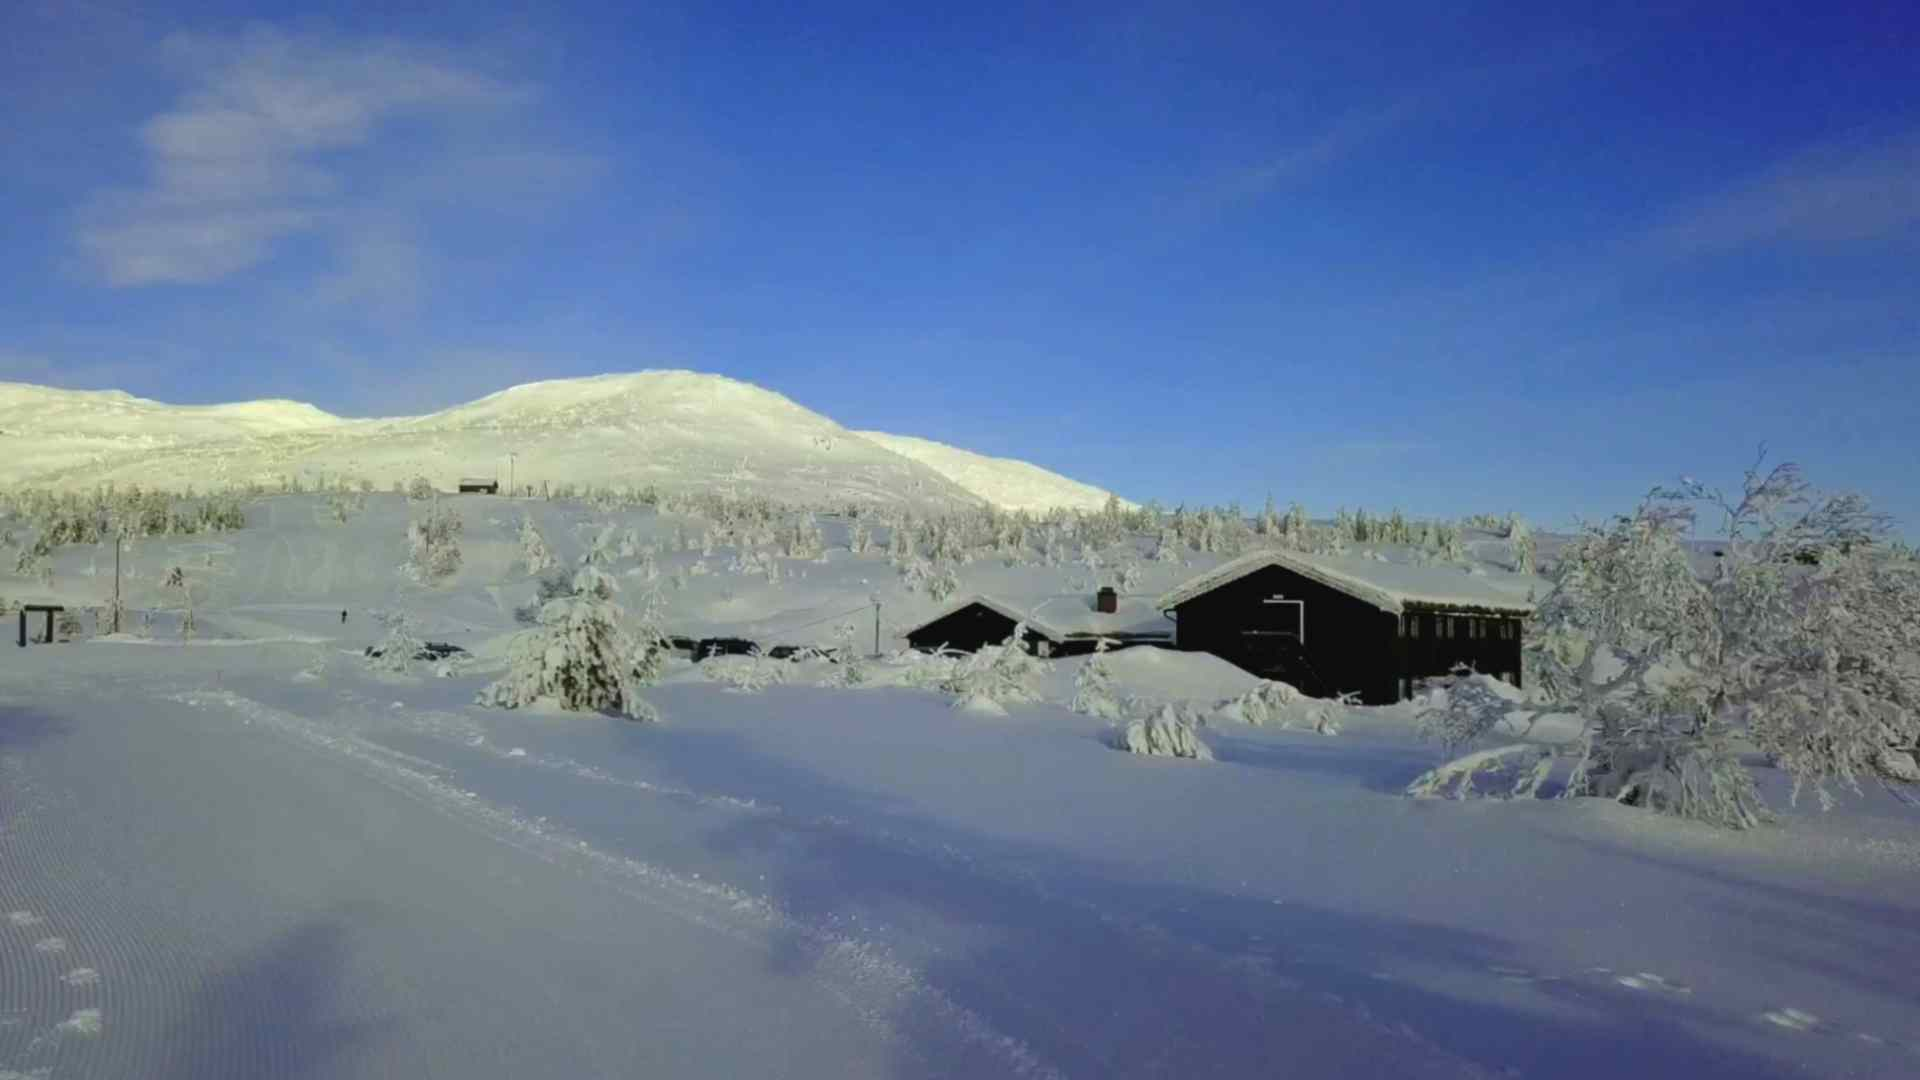 Lifjellstua